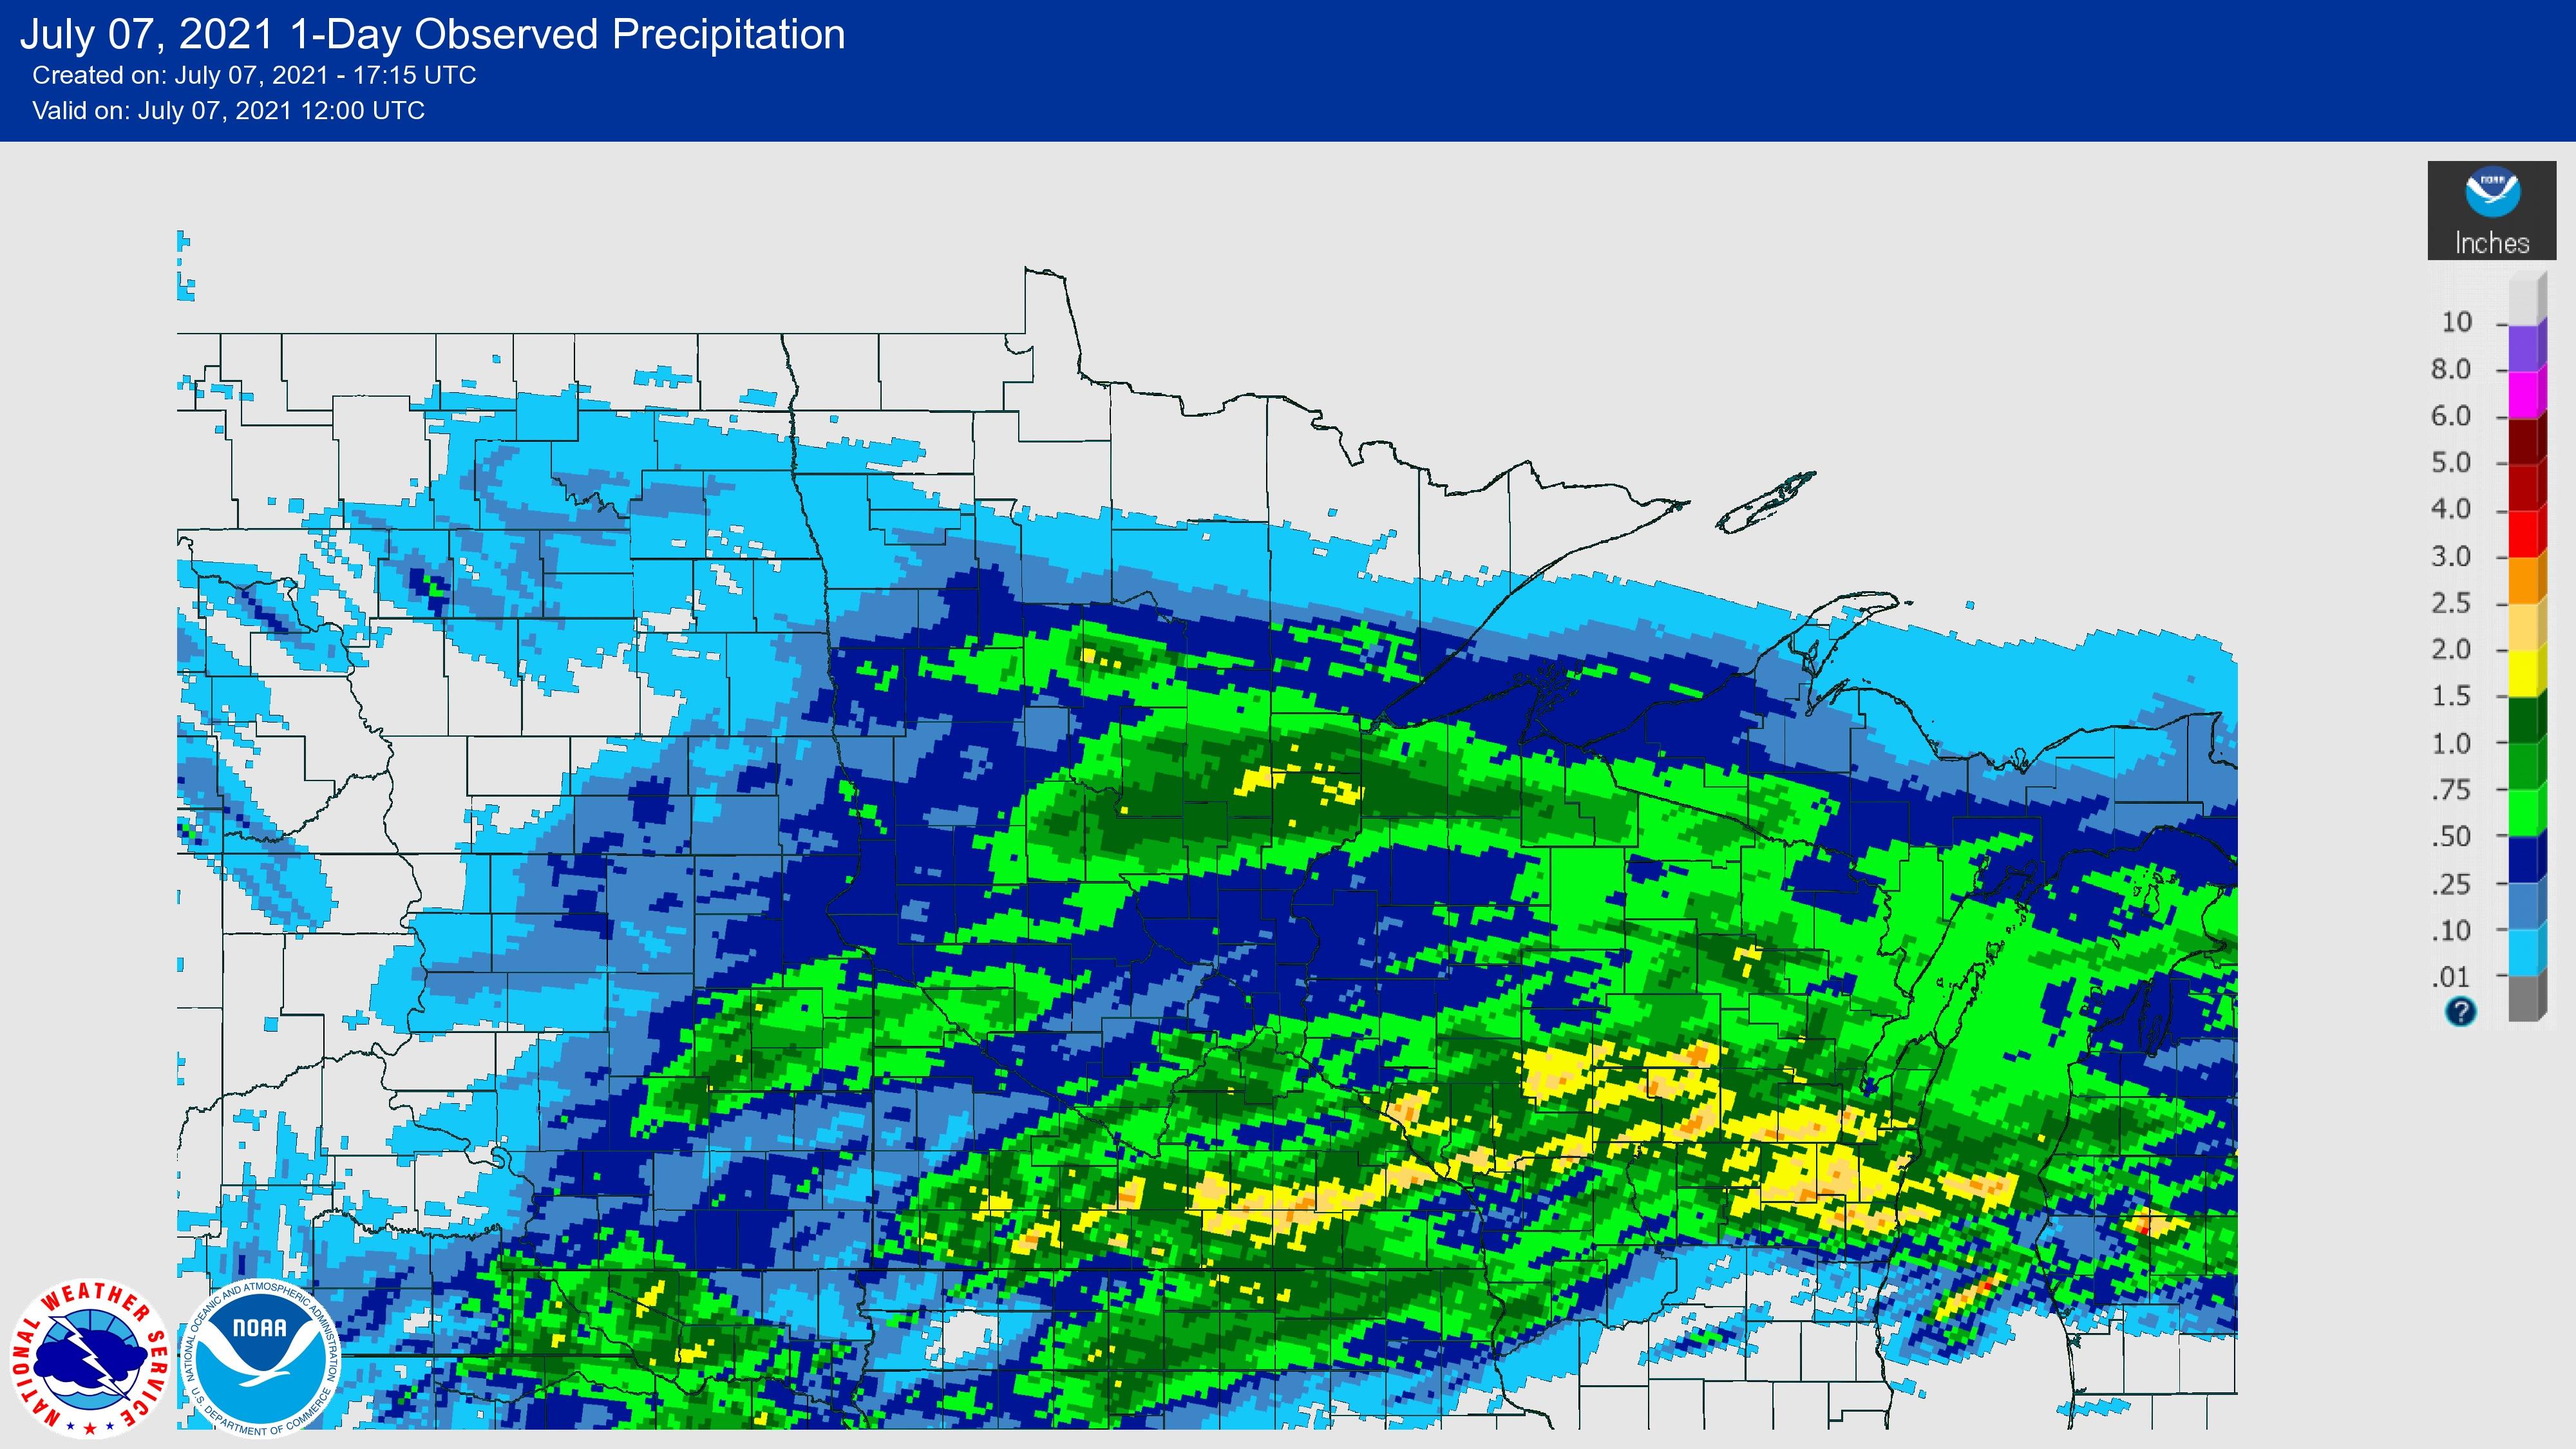 24 hour rainfall ending 7am July 7, 2021